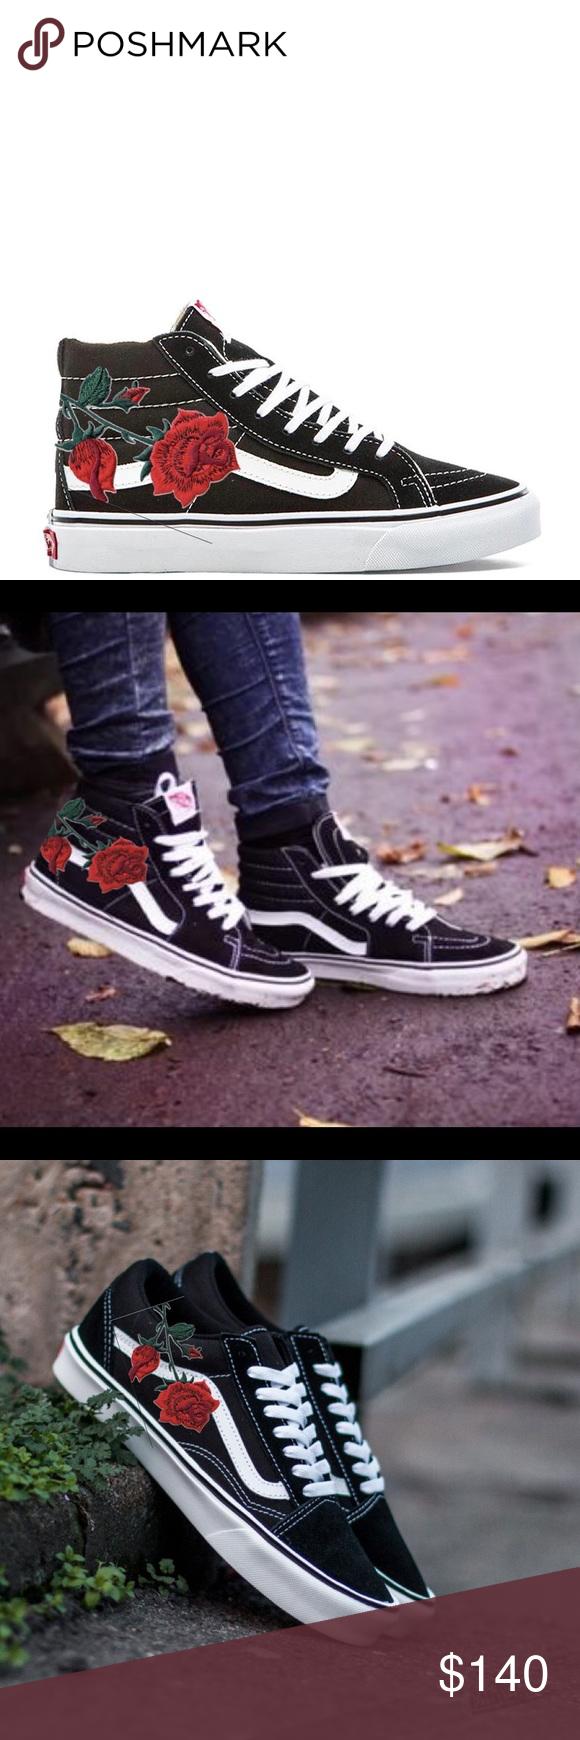 vans red rose